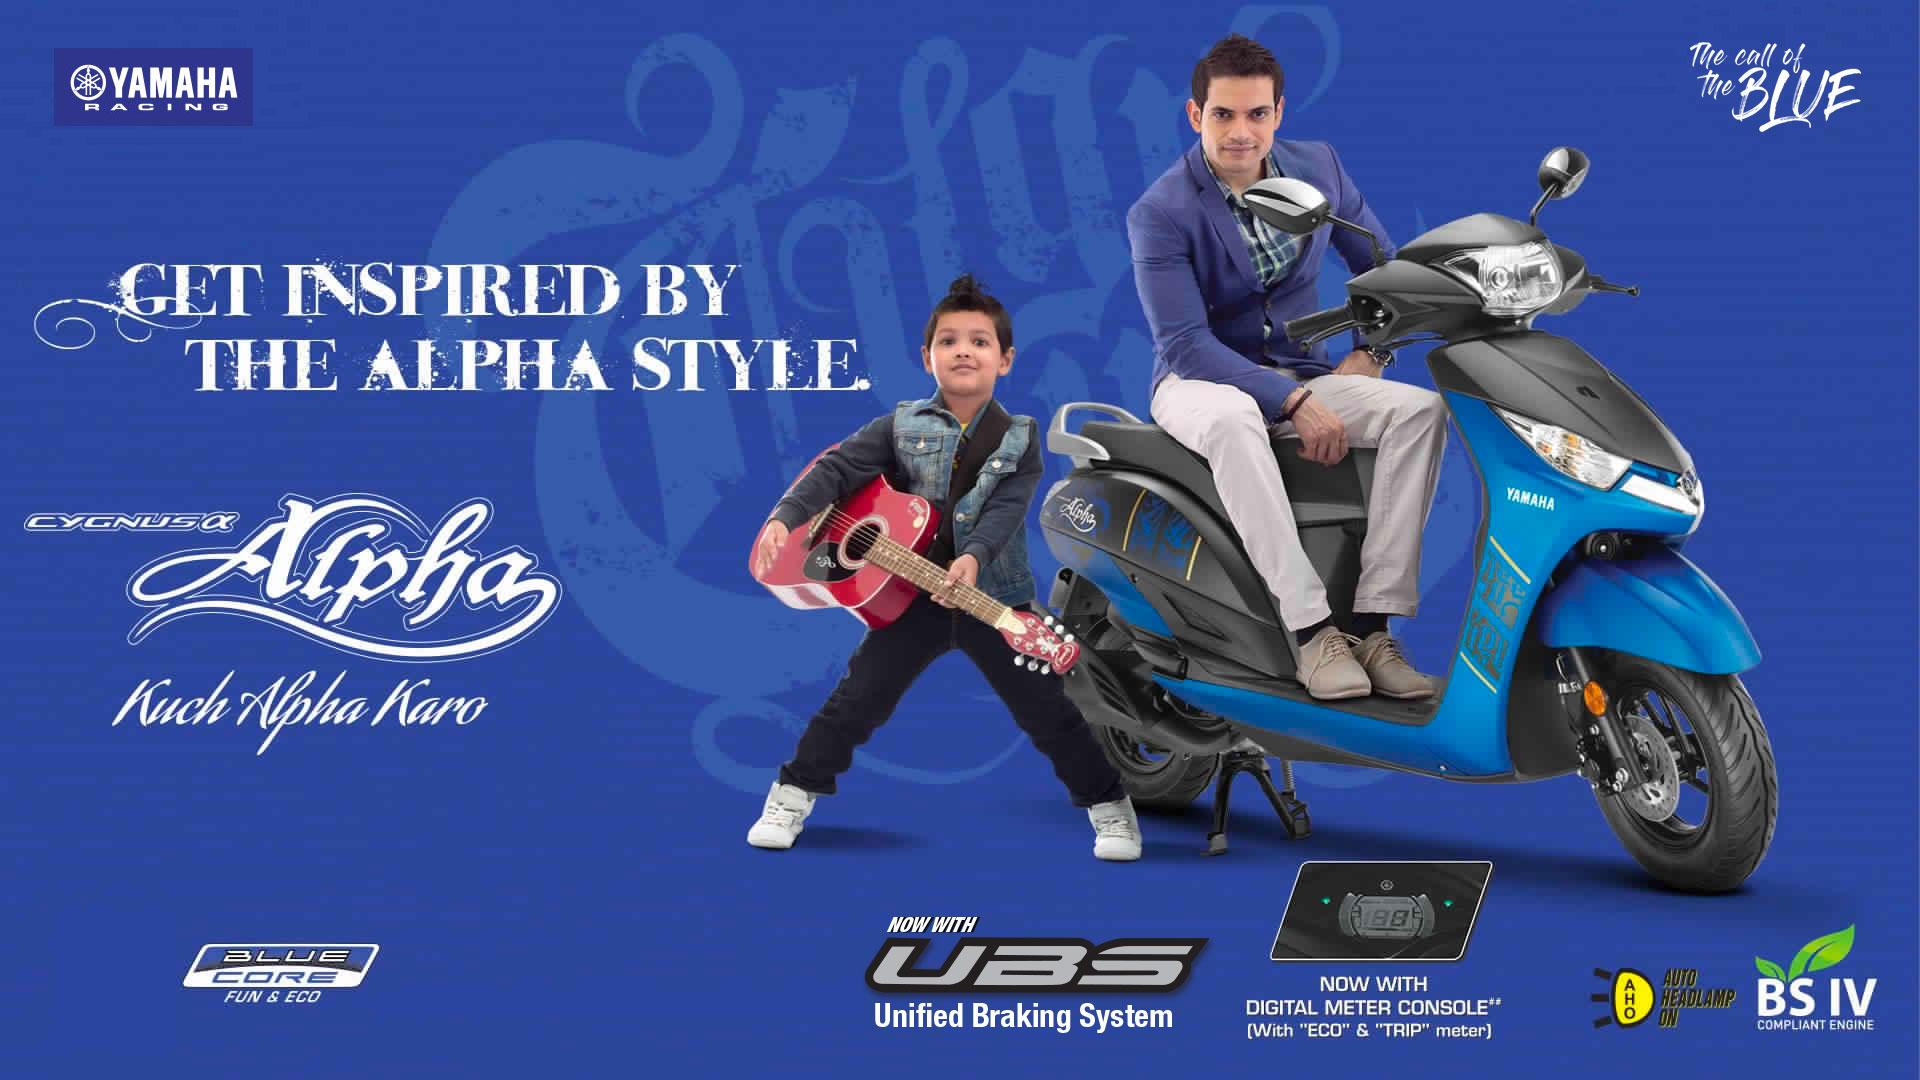 93cbf36caaee9 Yamaha Alpha Scooter - Features